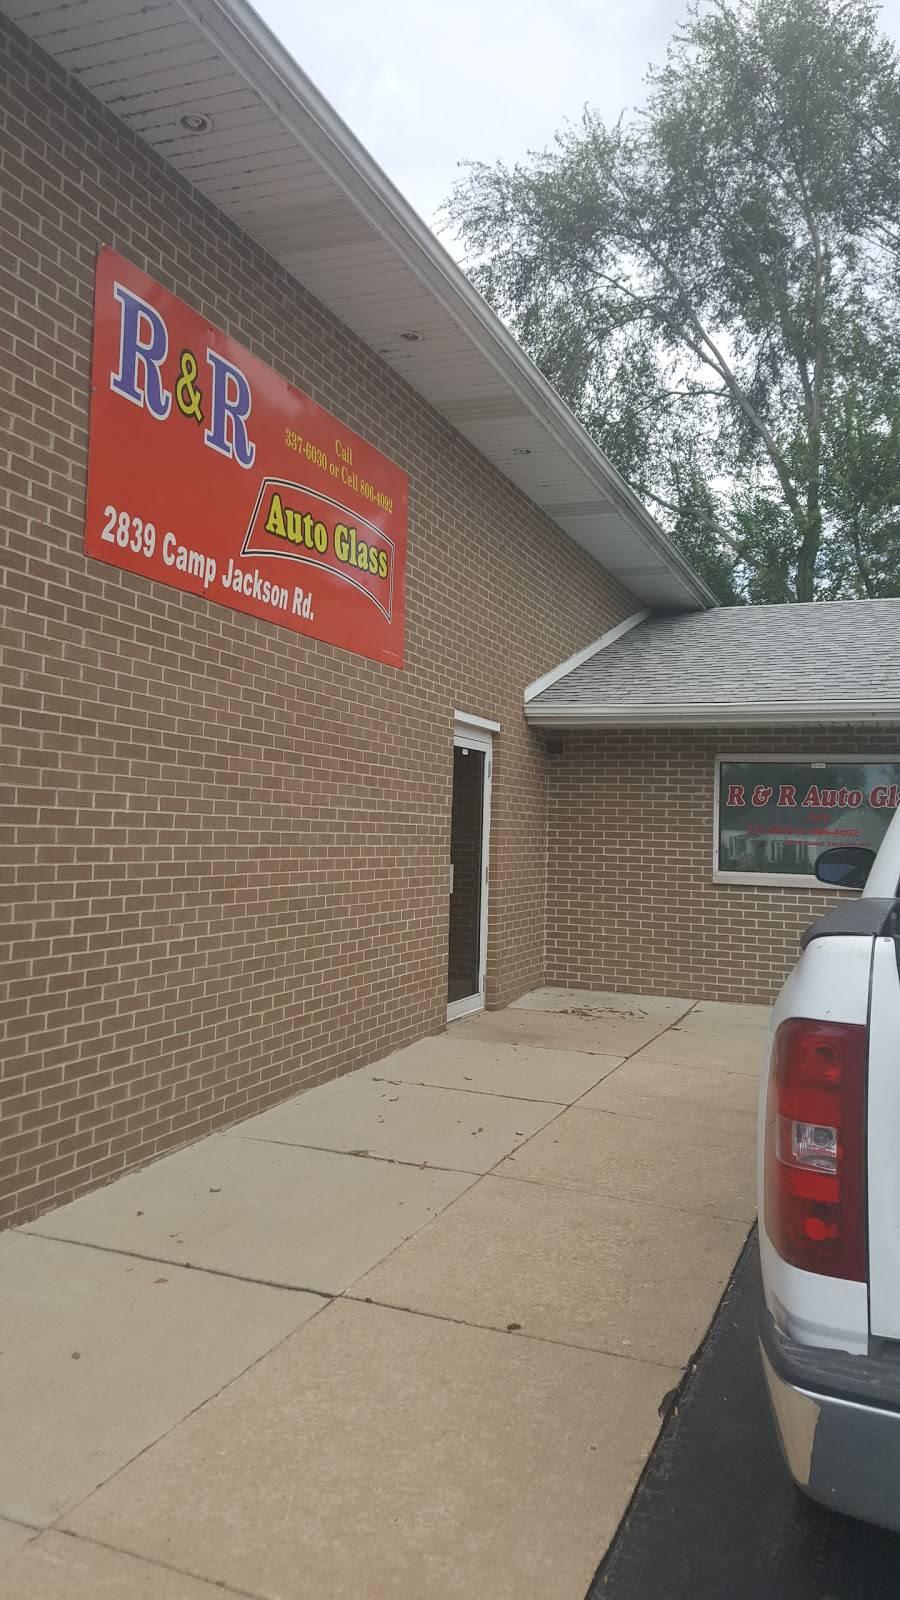 R & R Auto Glass - car repair  | Photo 2 of 4 | Address: 2839 Camp Jackson Rd, East St Louis, IL 62206, USA | Phone: (618) 337-6030